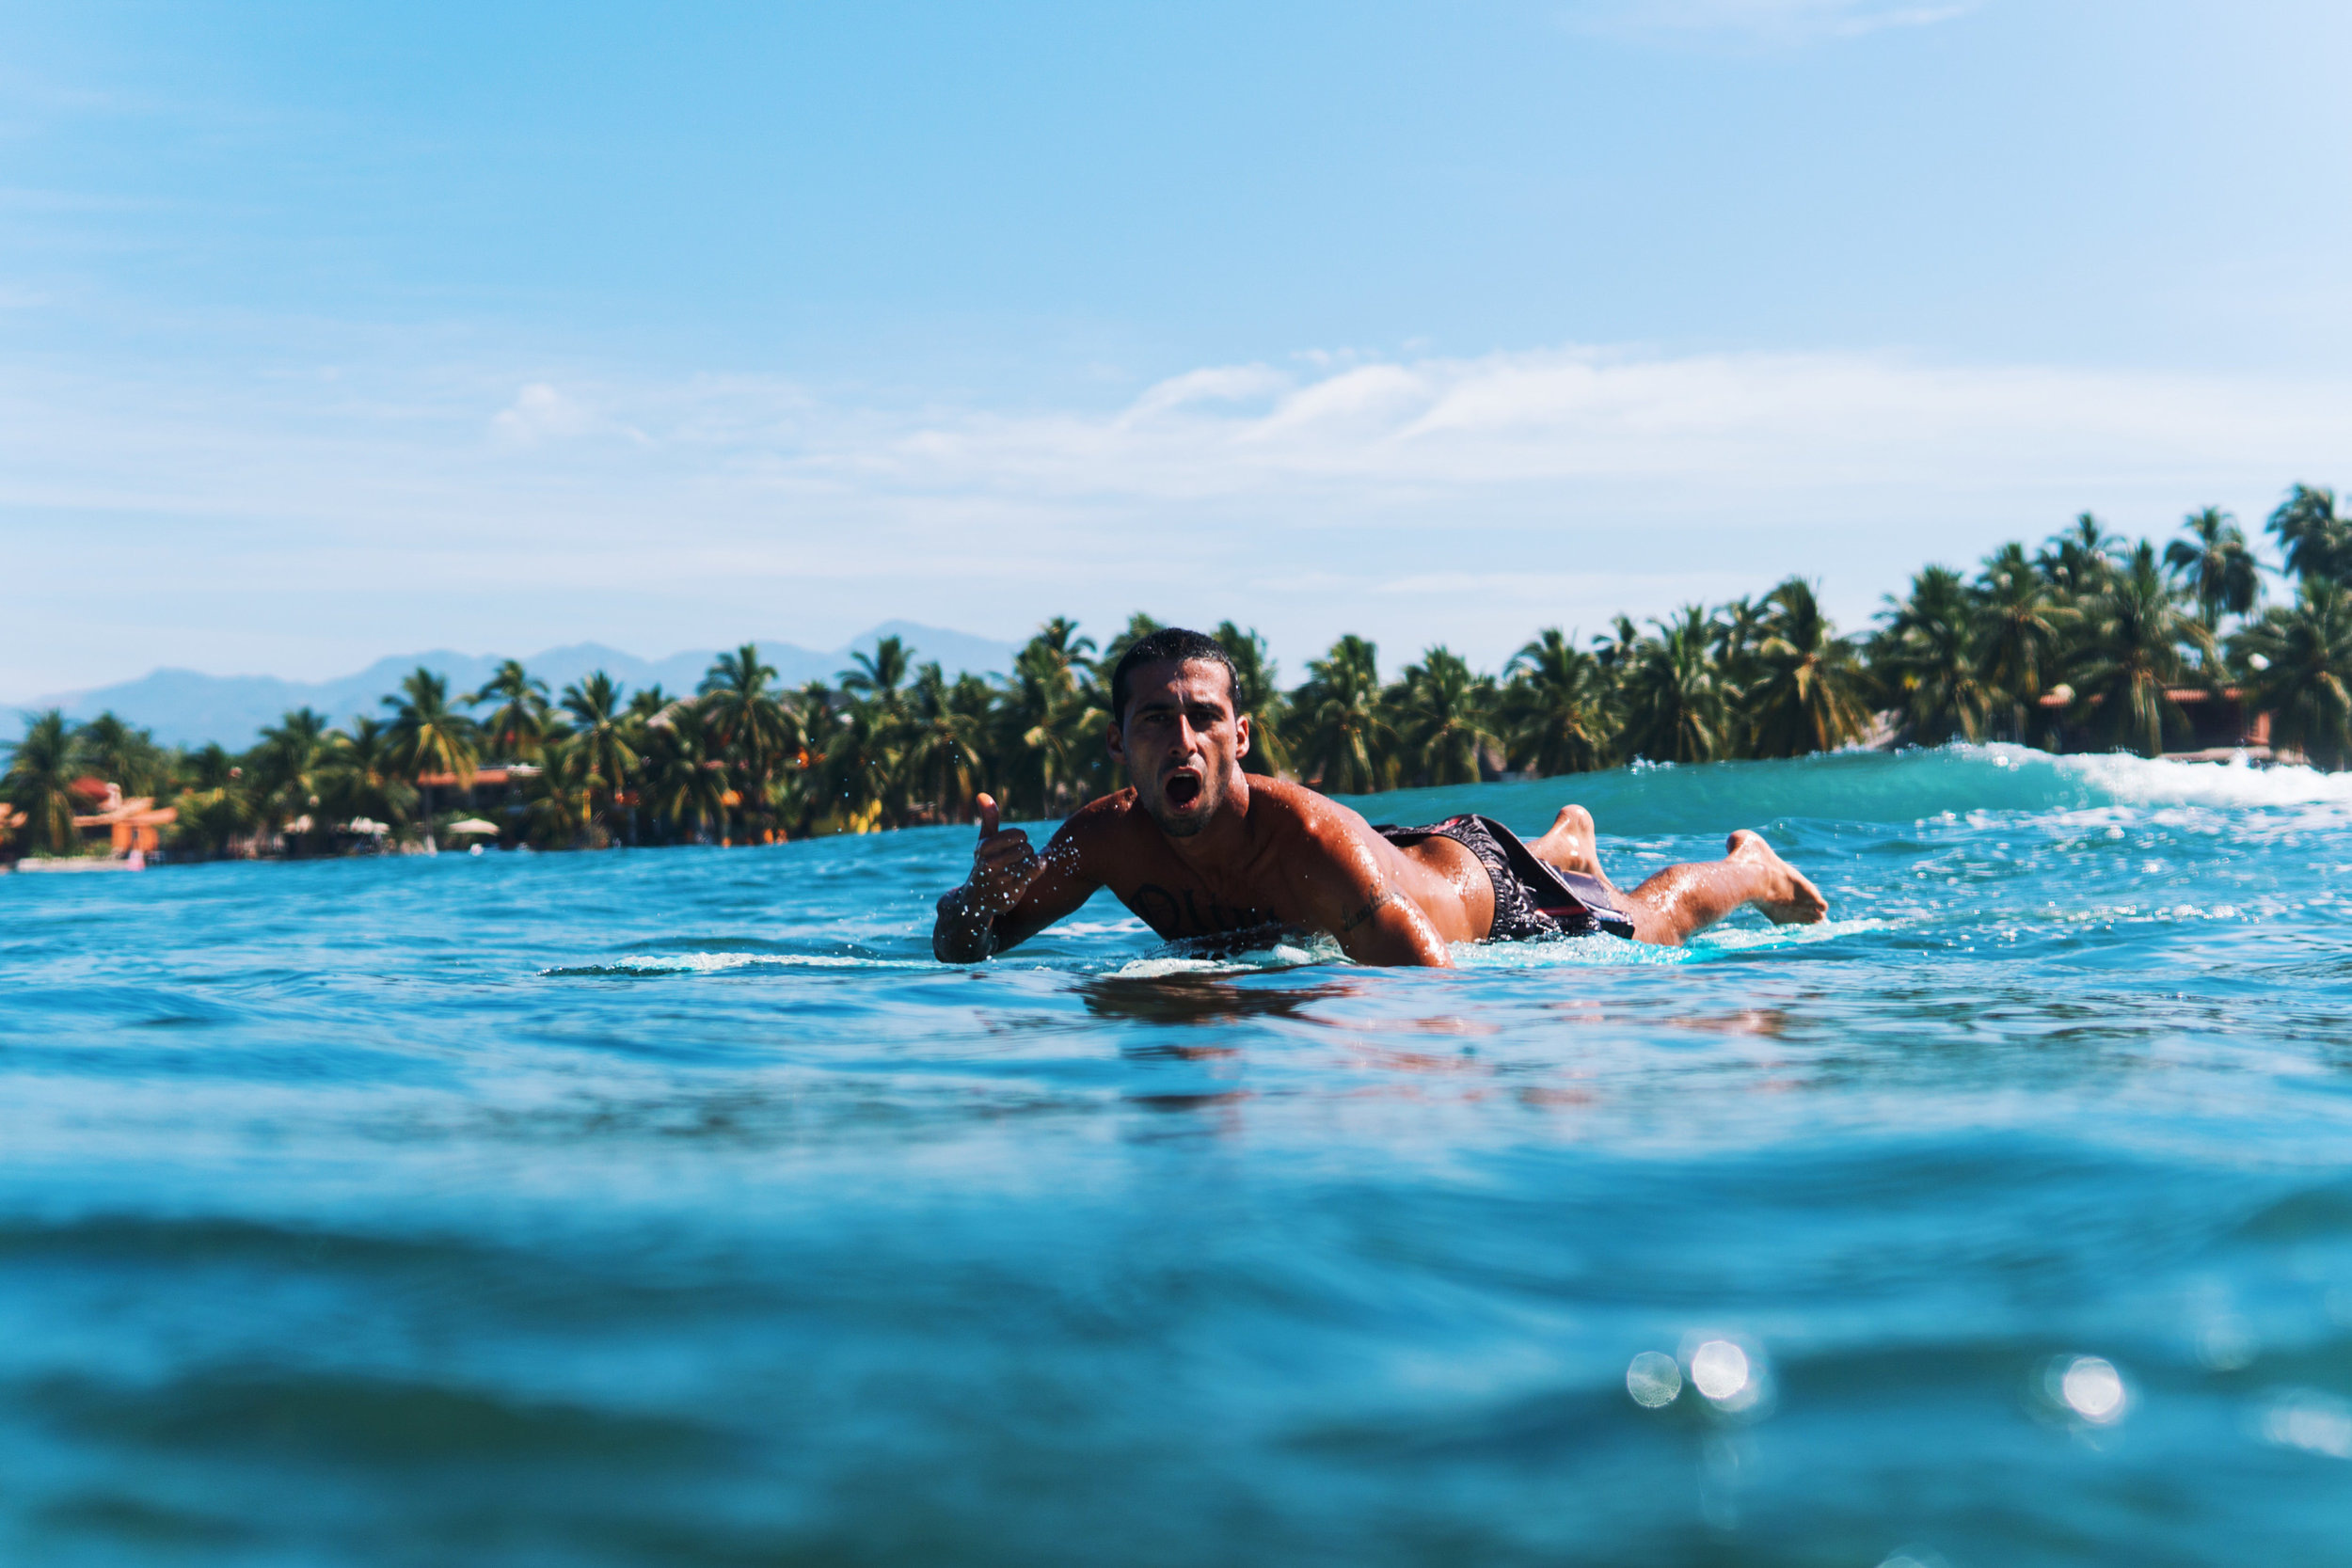 Surf-Mexico-Zihuatanejo-Sayulita-Ixtapa-Zihuatanejo-Diego-Cadena-Olas-Fotografia-Heiko-Bothe-8.jpg